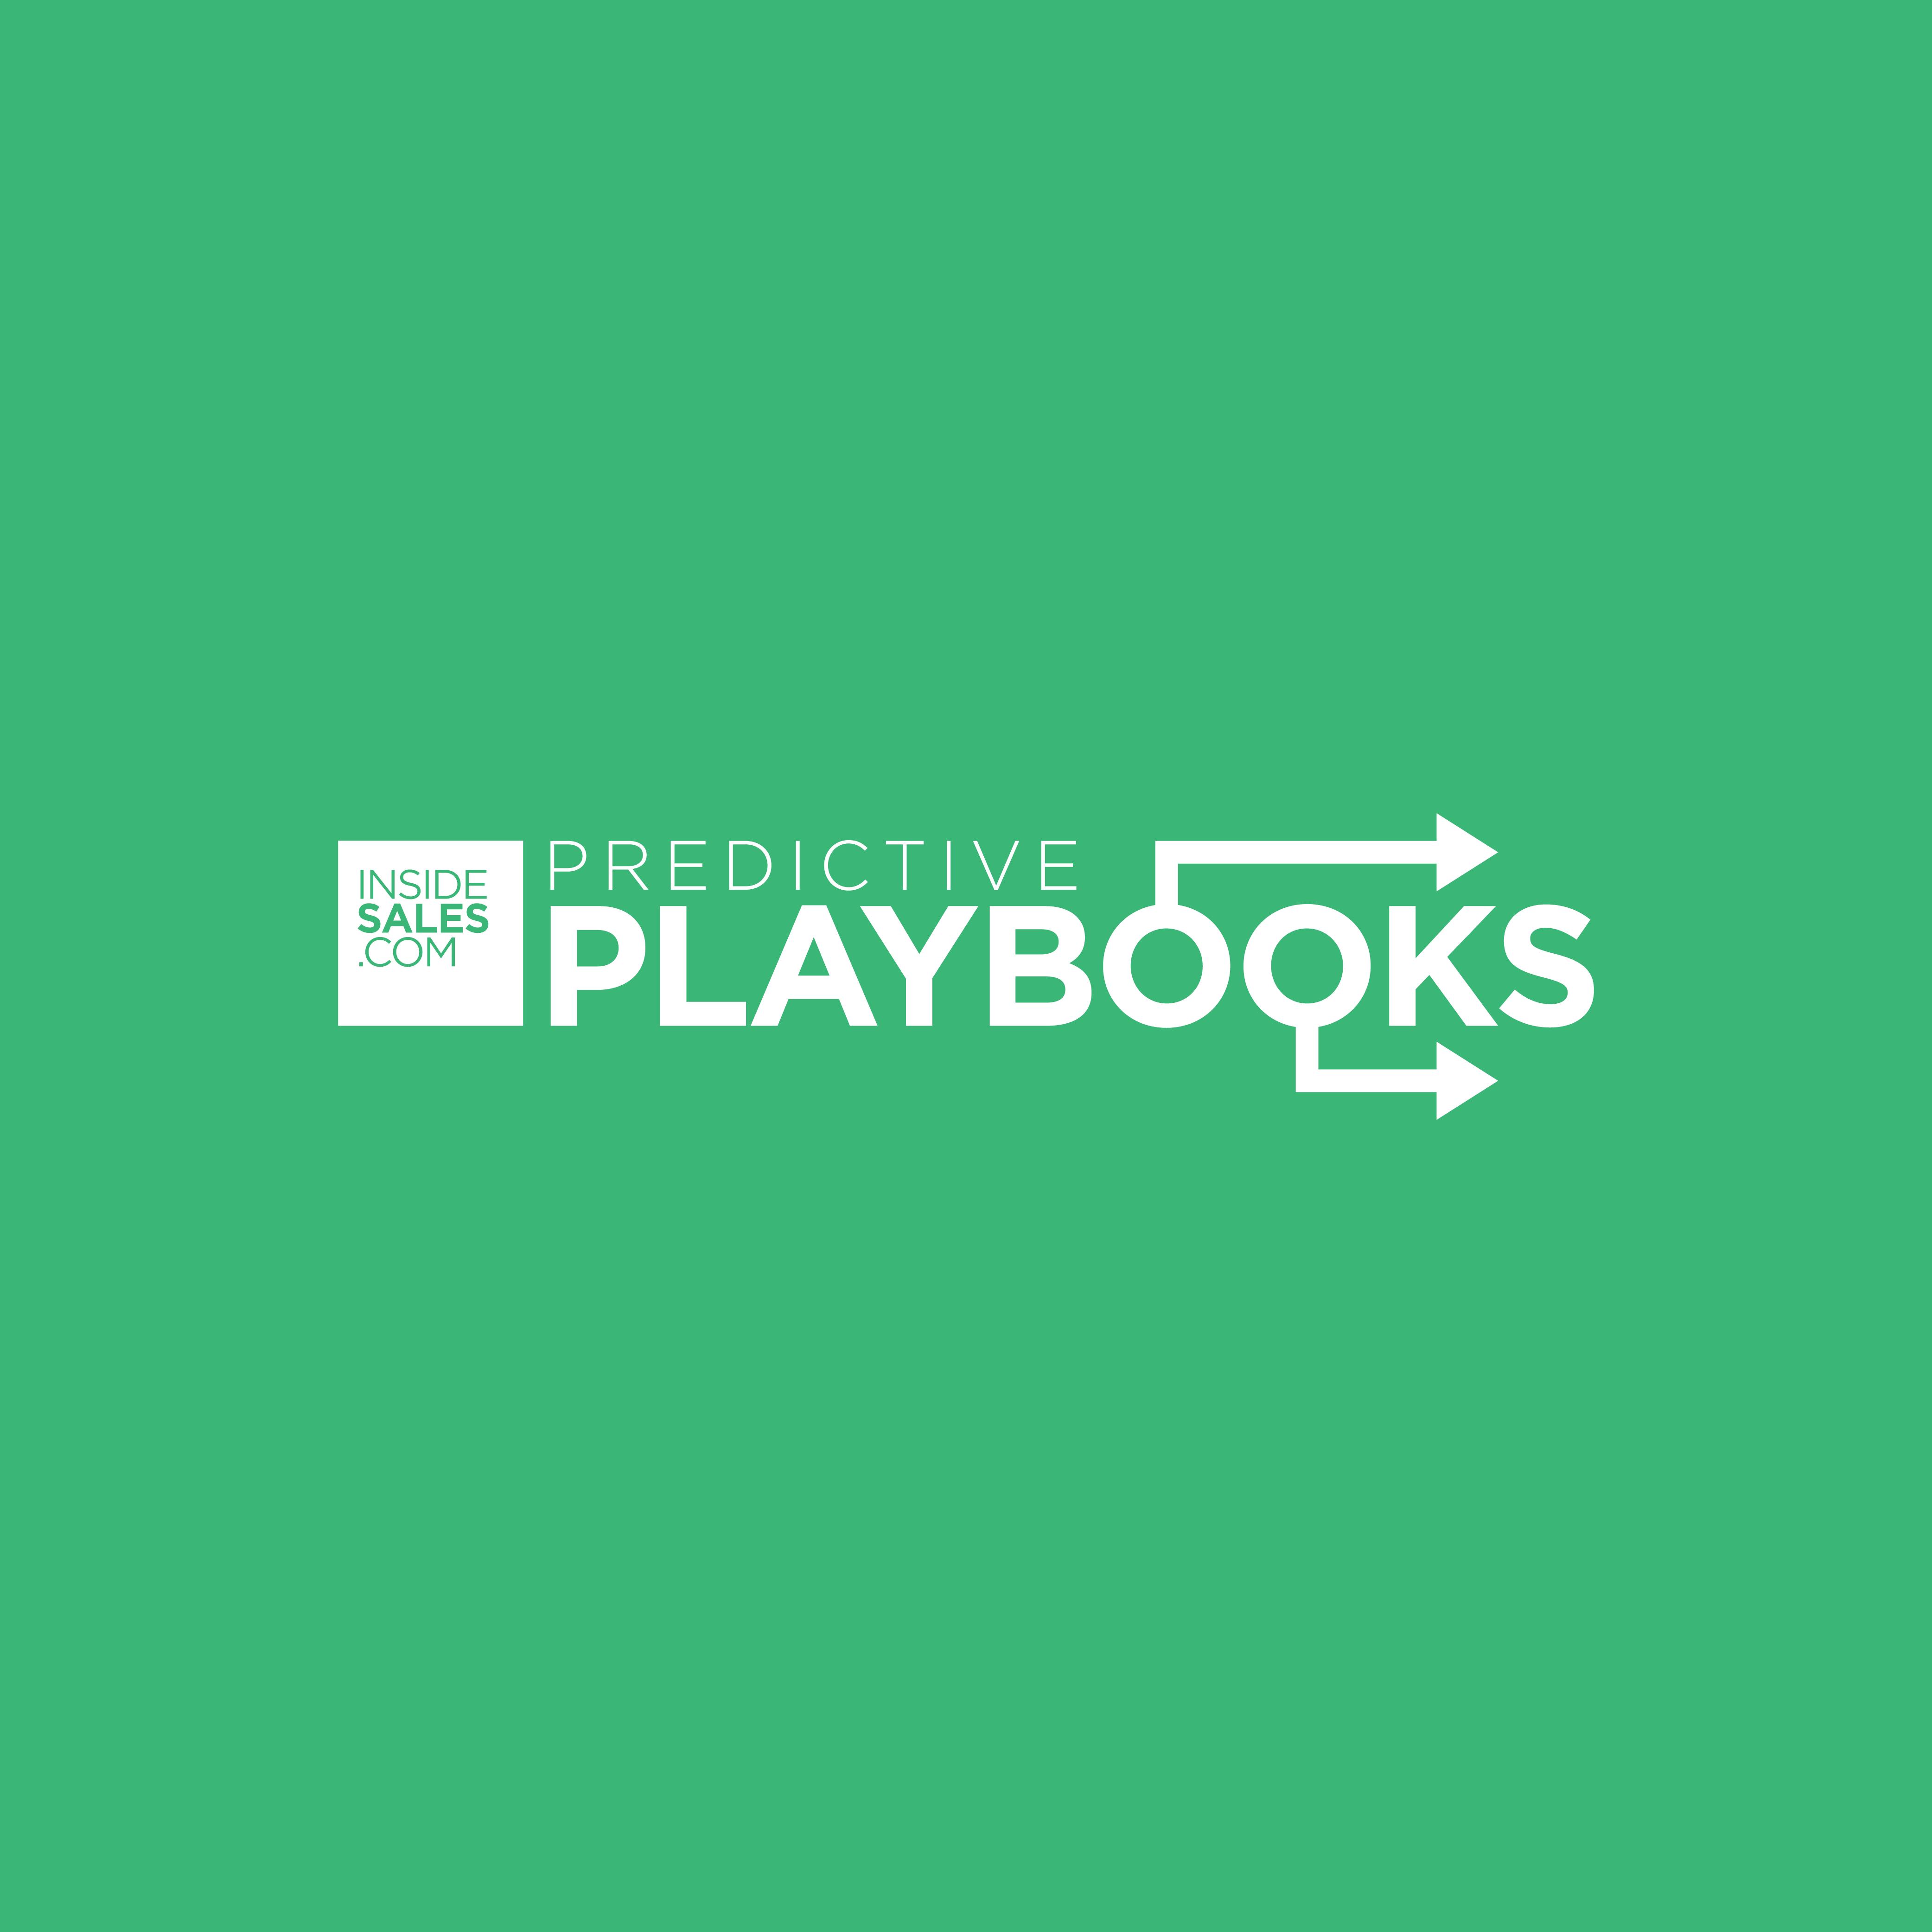 InsideSales.com Predictive Playbooks